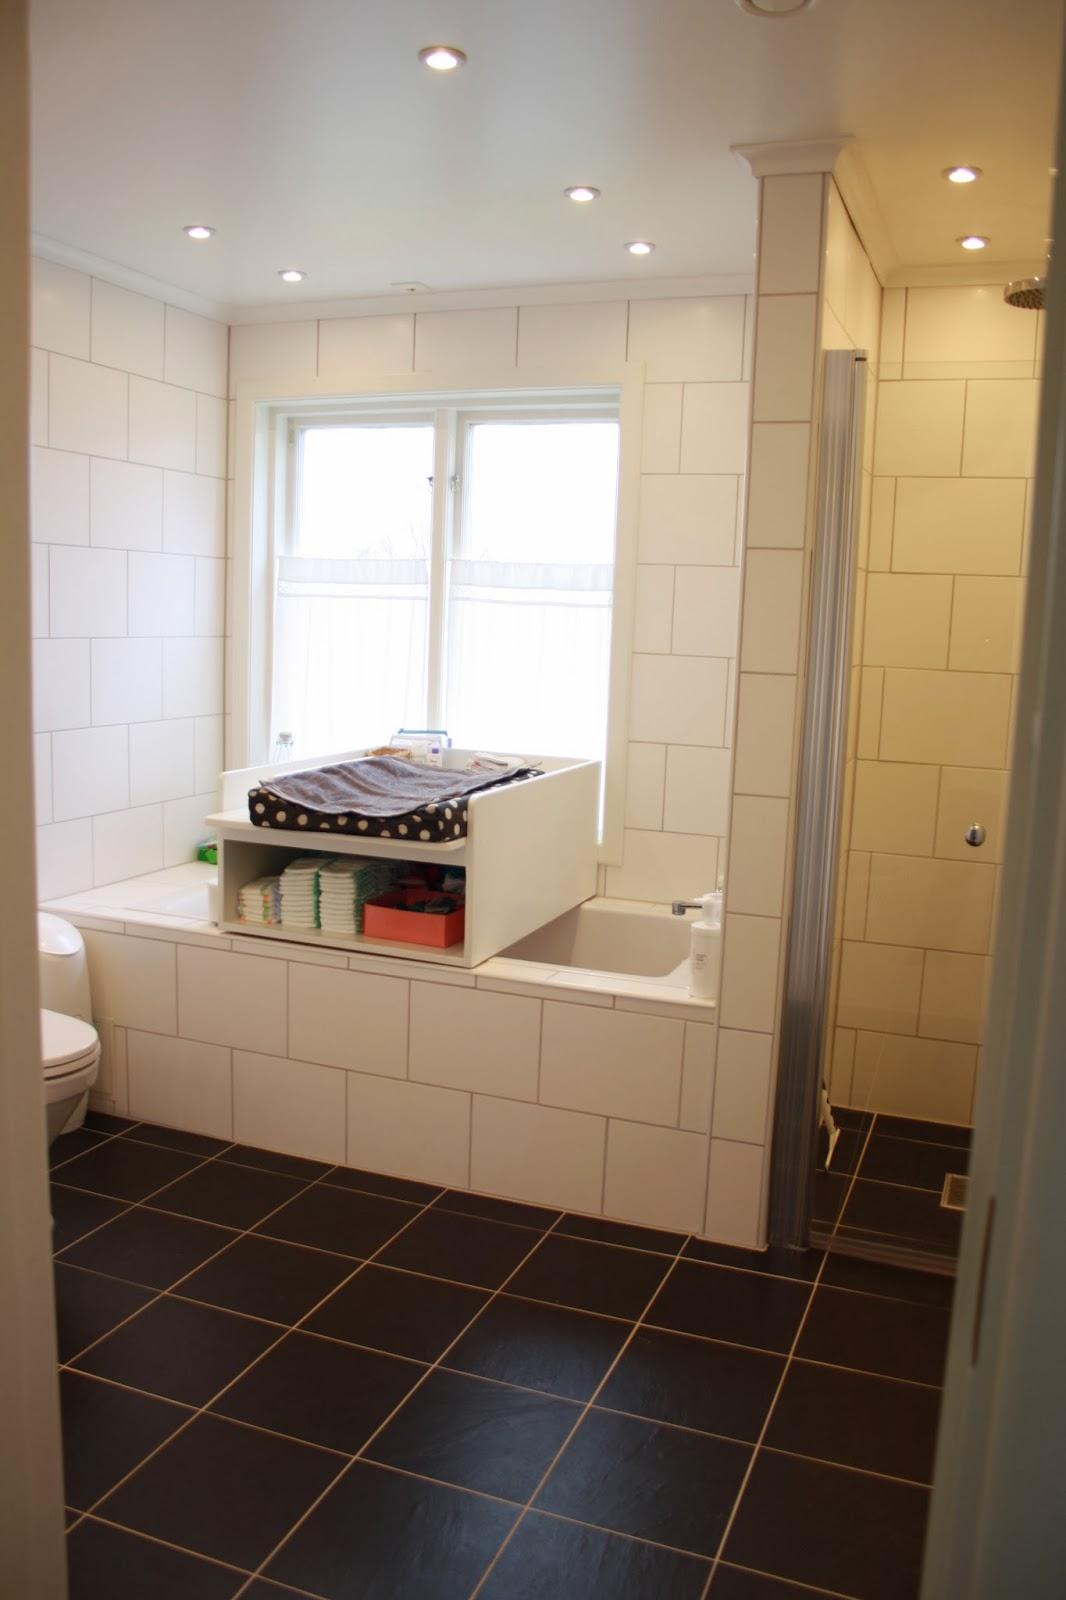 Dagdrömmar & verklighet: mintgrönt i badrummet